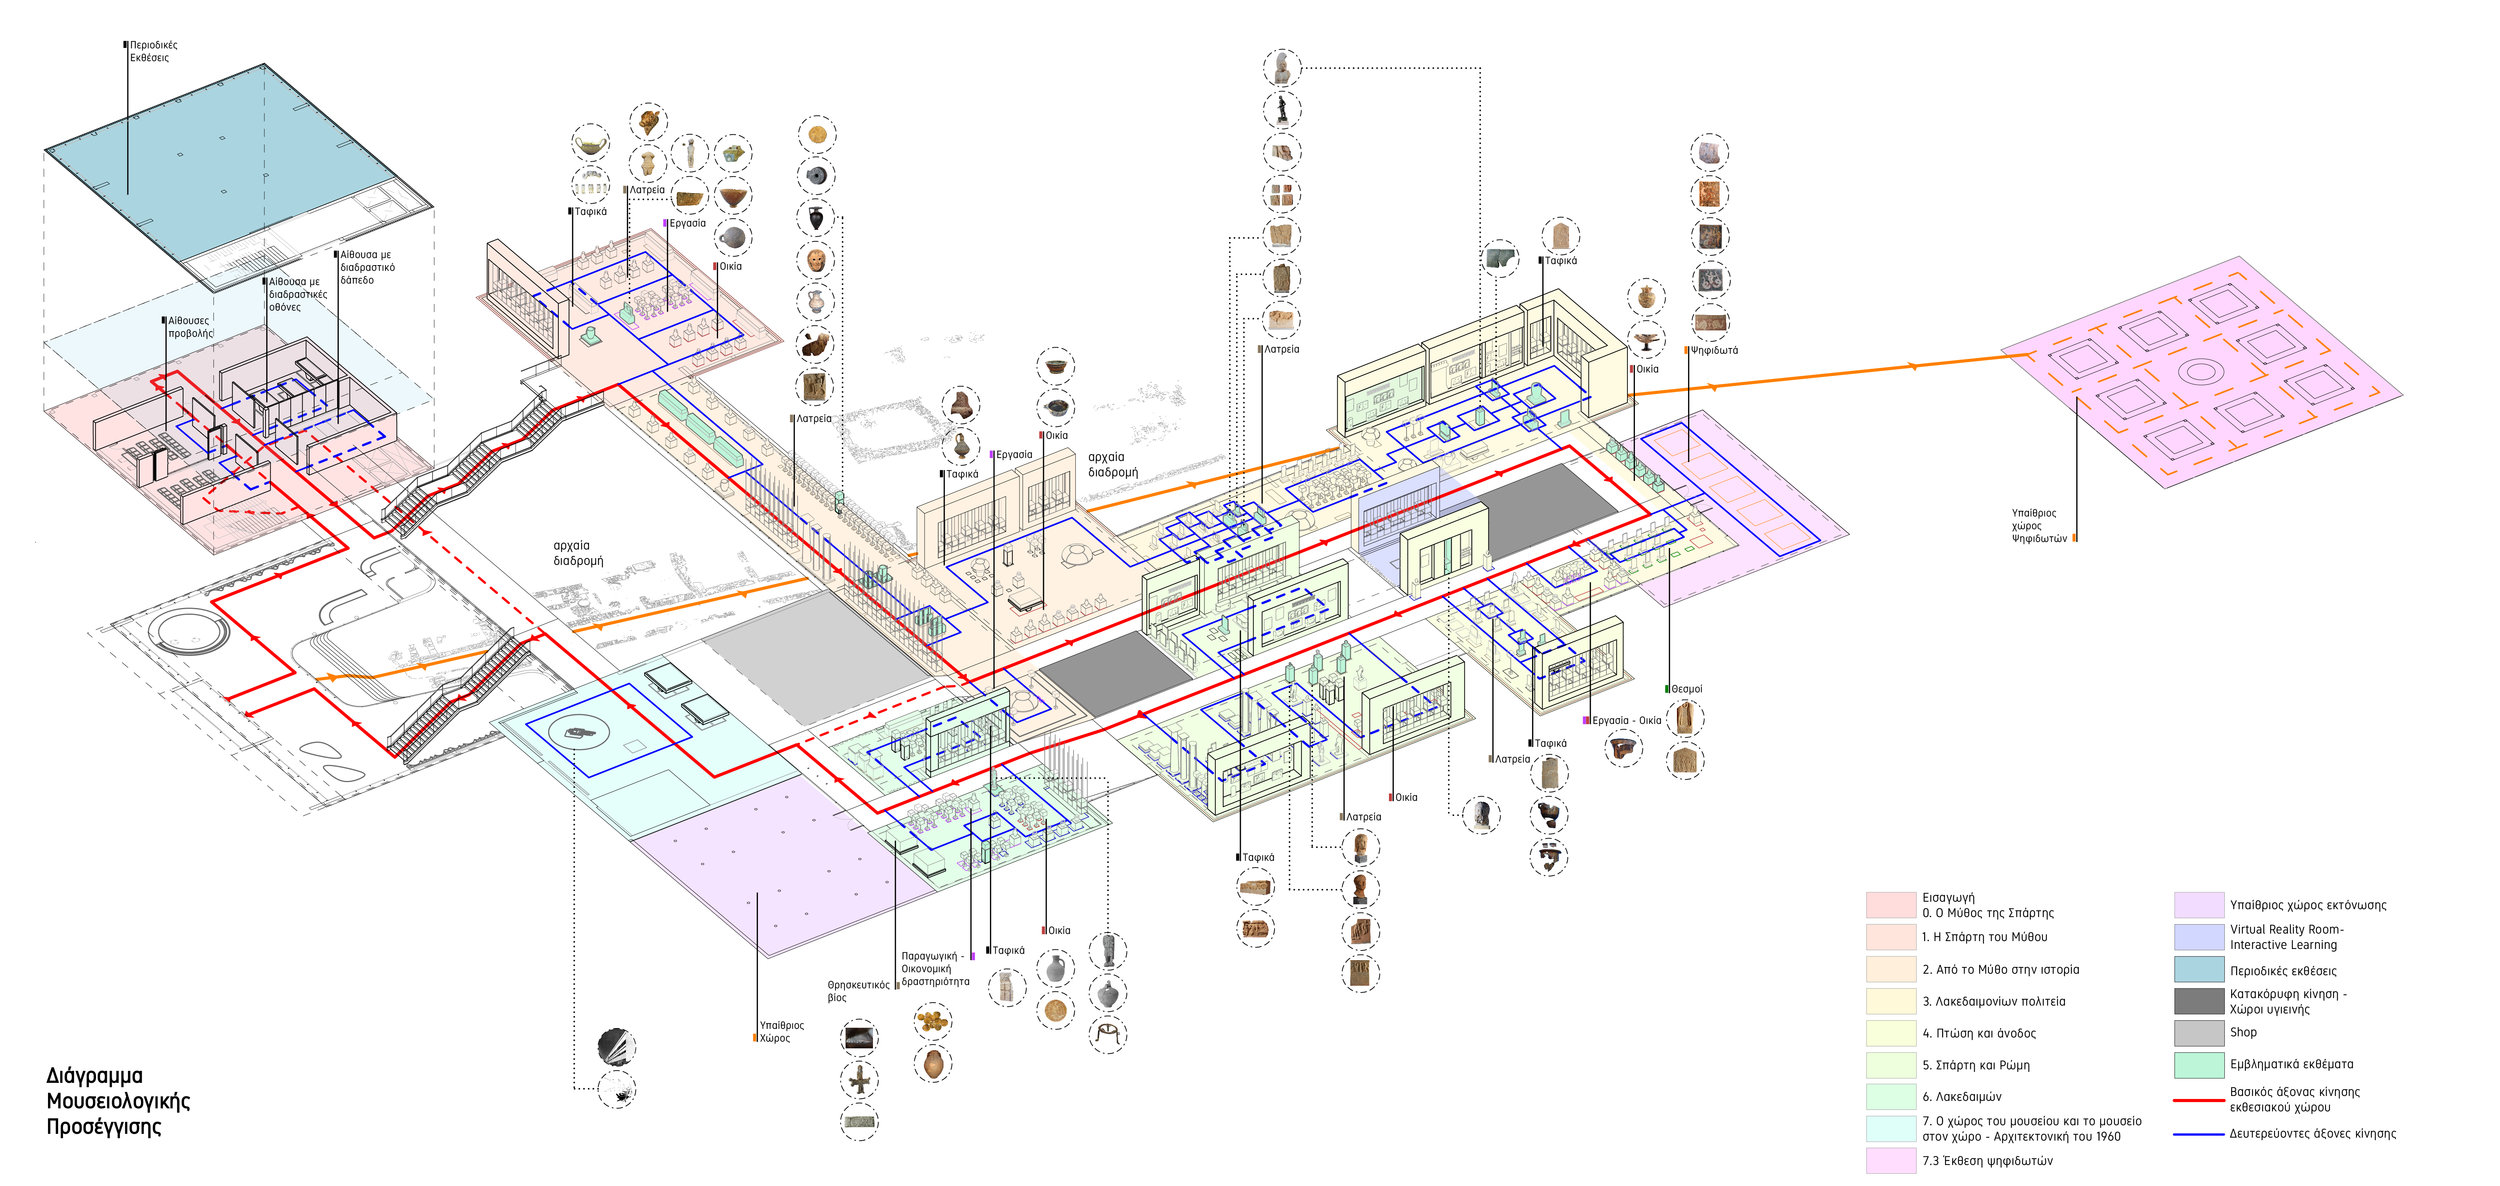 exhibition_diagramm1600Pixels-01.jpg